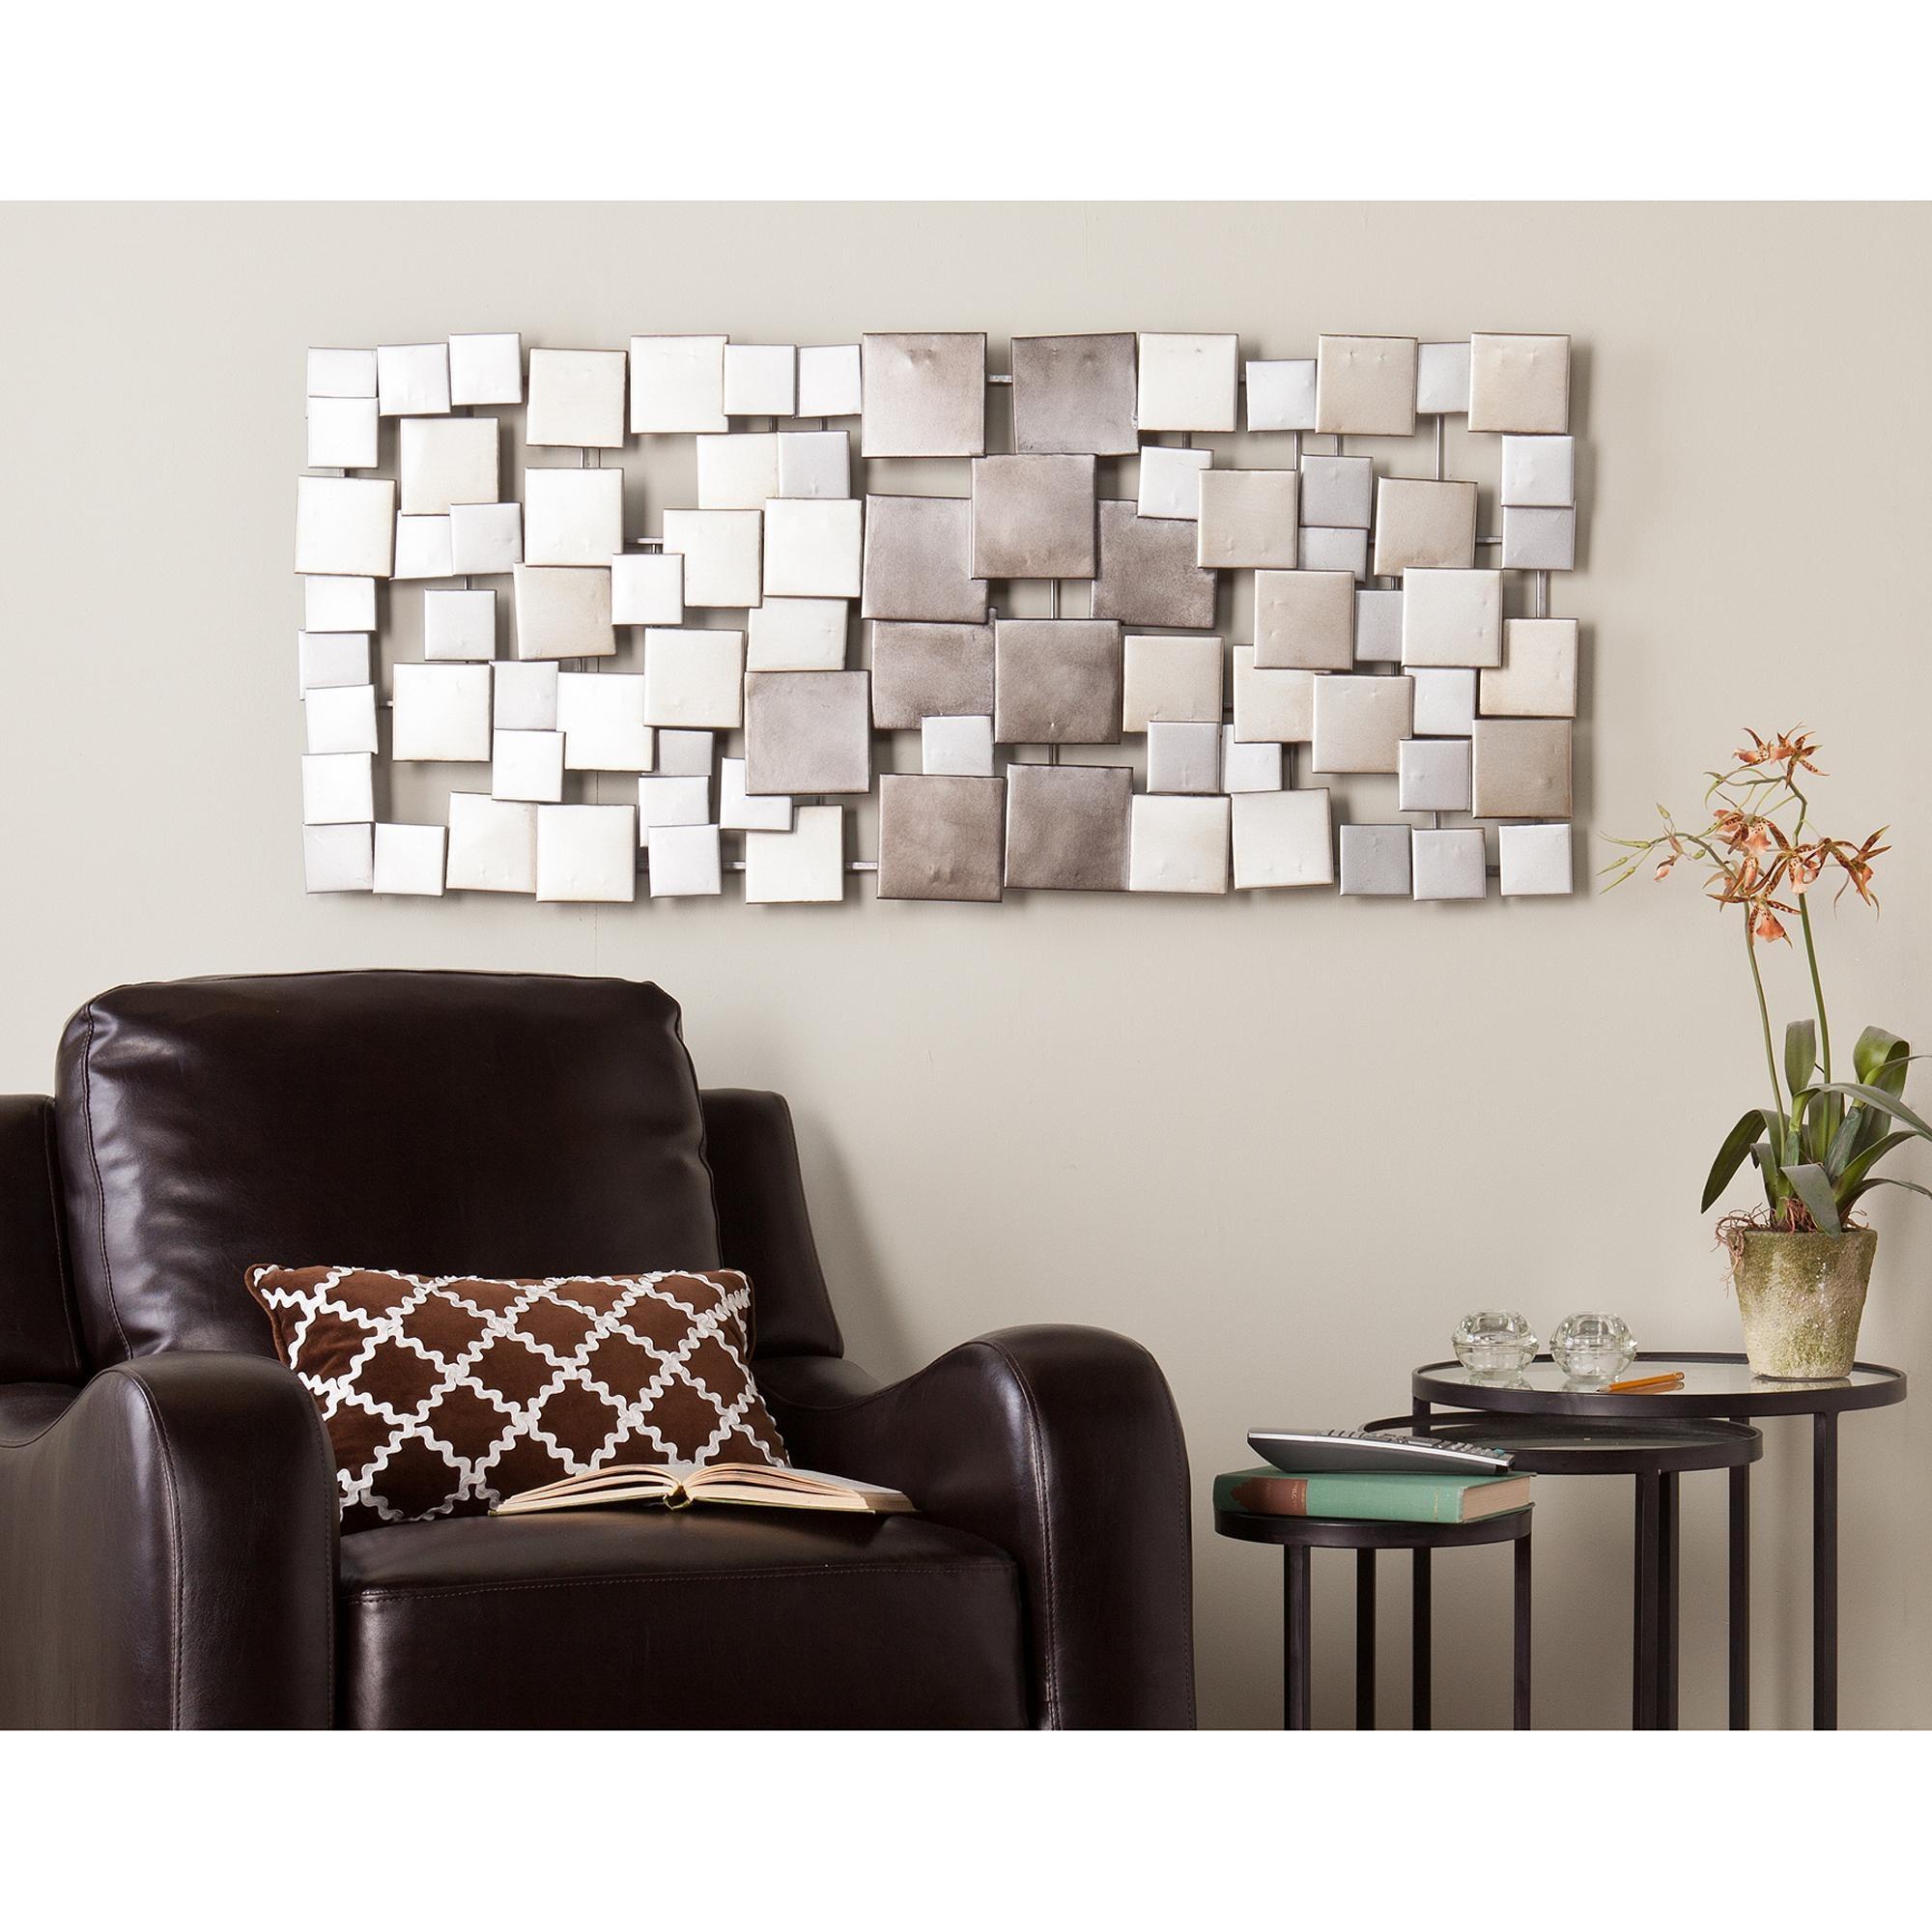 Metal Wall Art – Walmart With Decorative Metal Disc Wall Art (View 12 of 18)